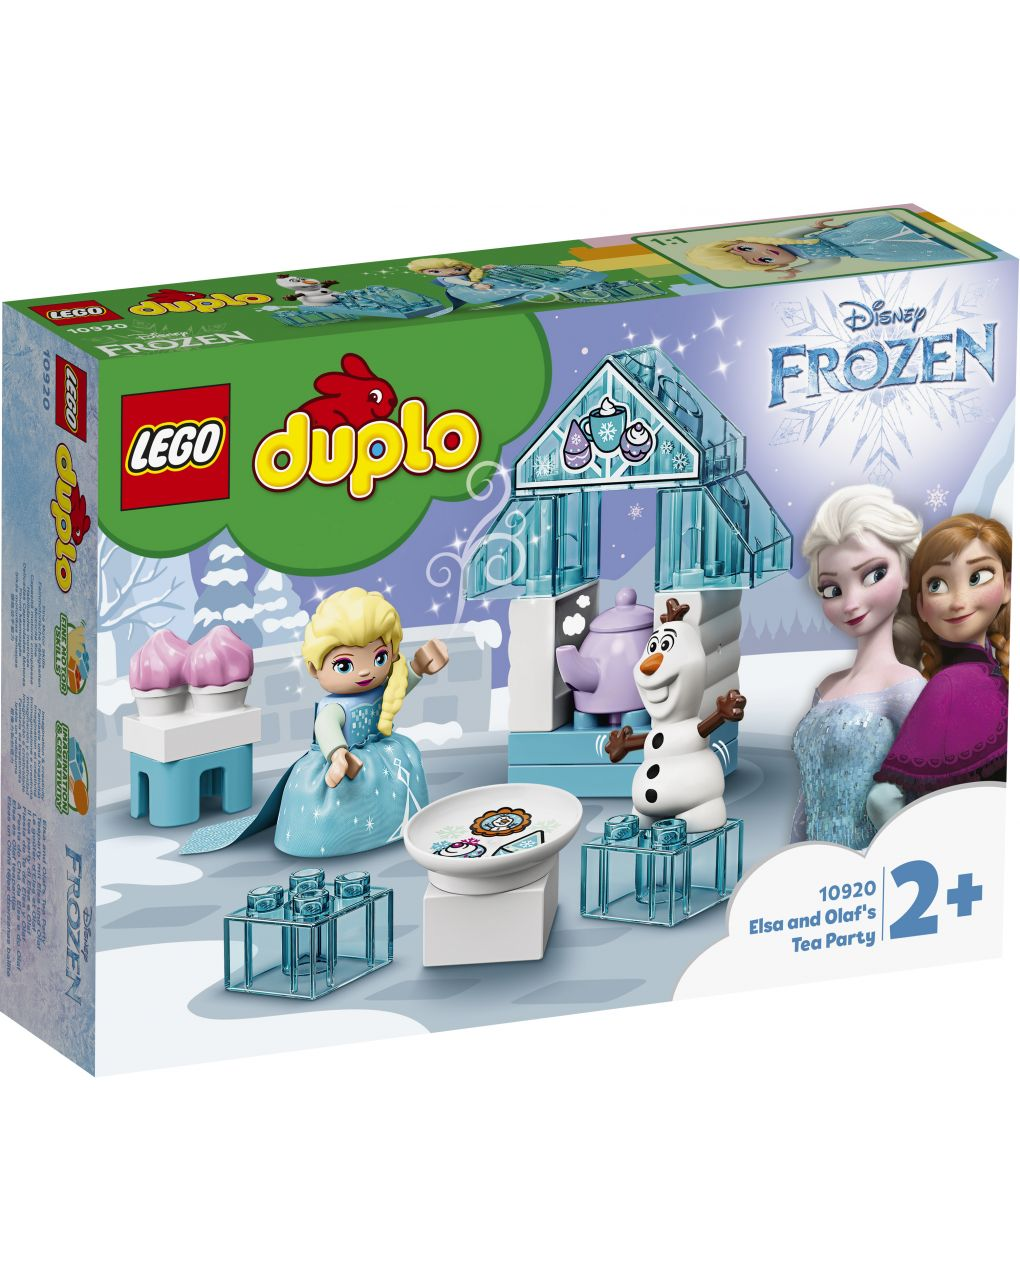 Duplo - il tea party di elsa e olaf - 10920 - LEGO Duplo